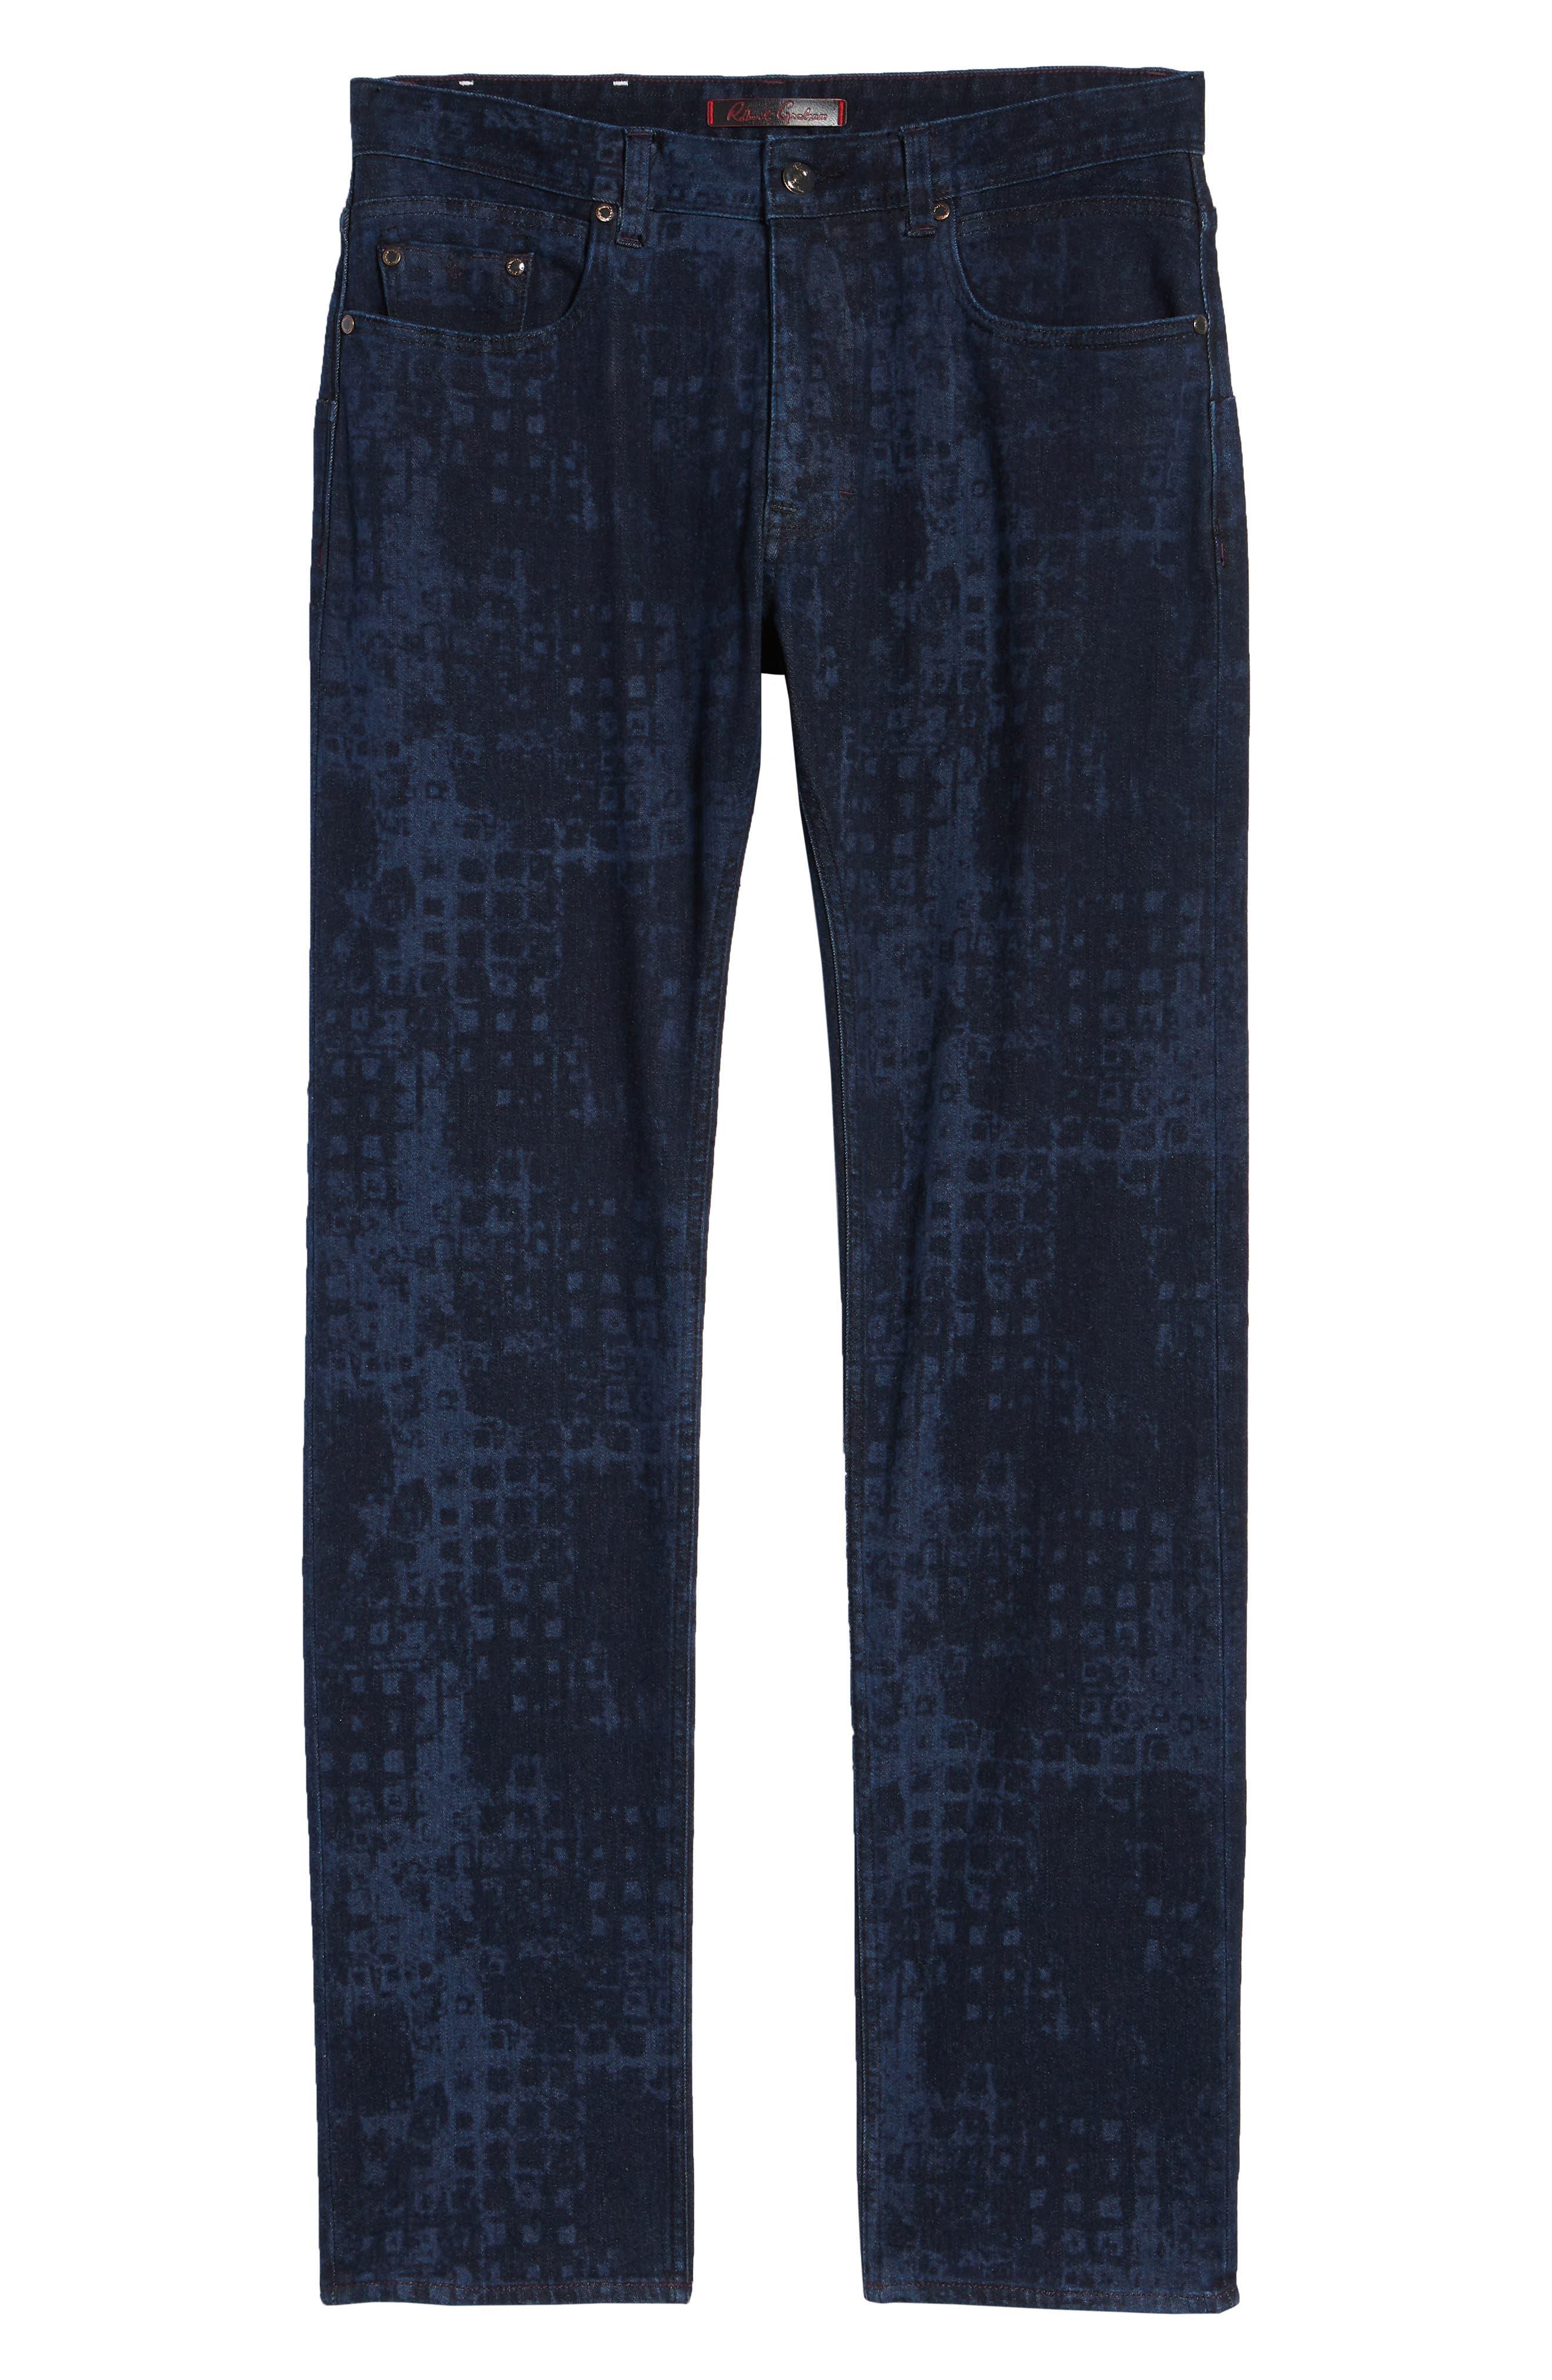 Chilcott Classic Fit Jeans,                             Alternate thumbnail 6, color,                             INDIGO